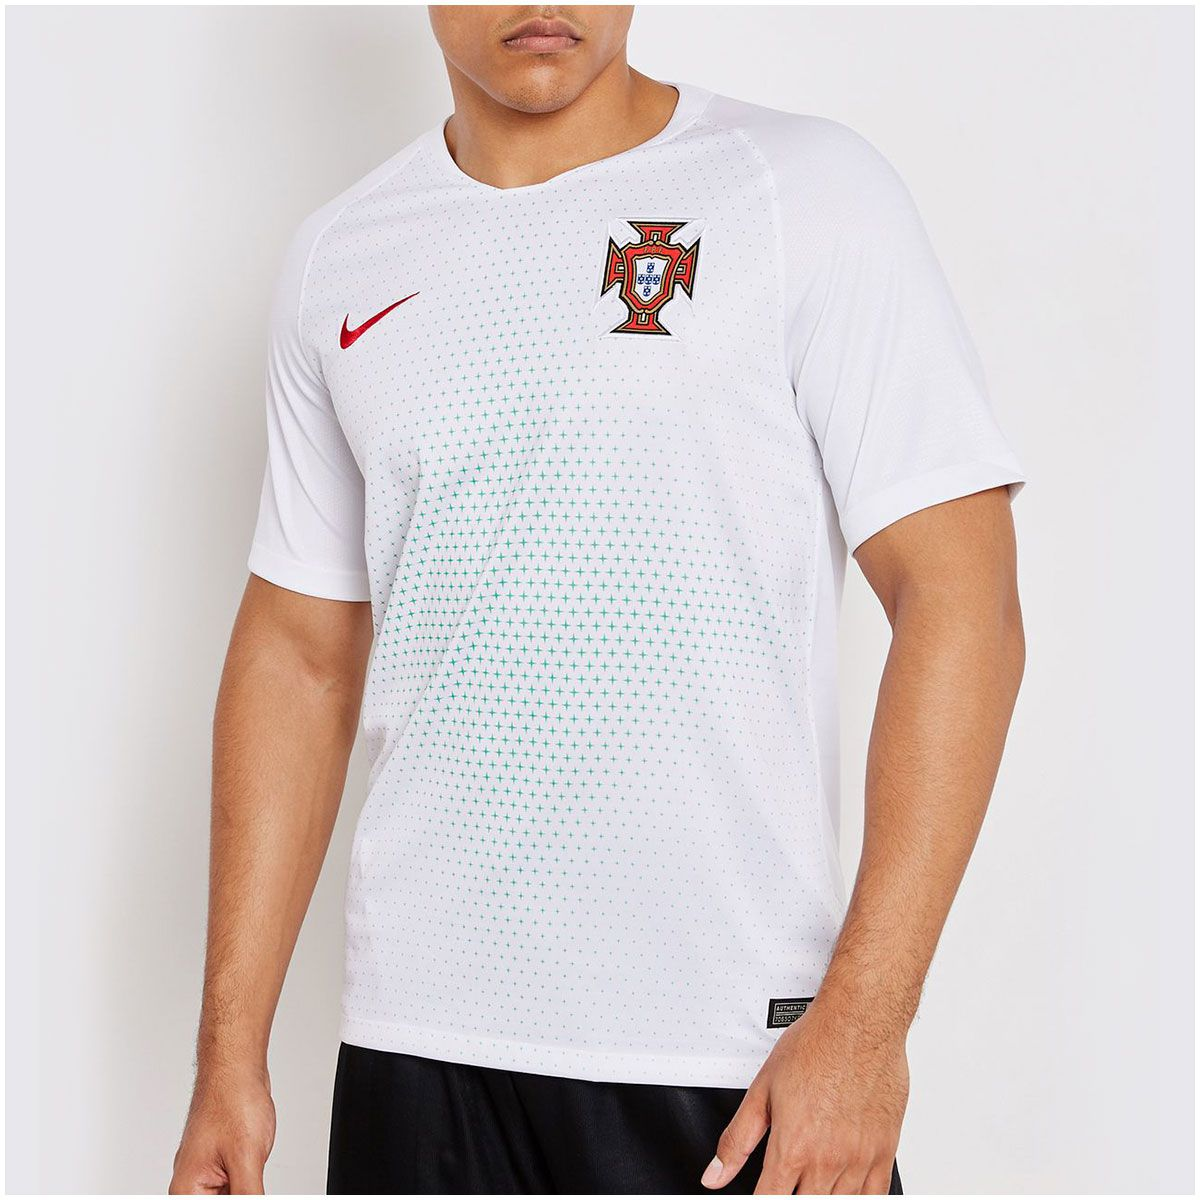 Camisa Portugal Away Nike 2018